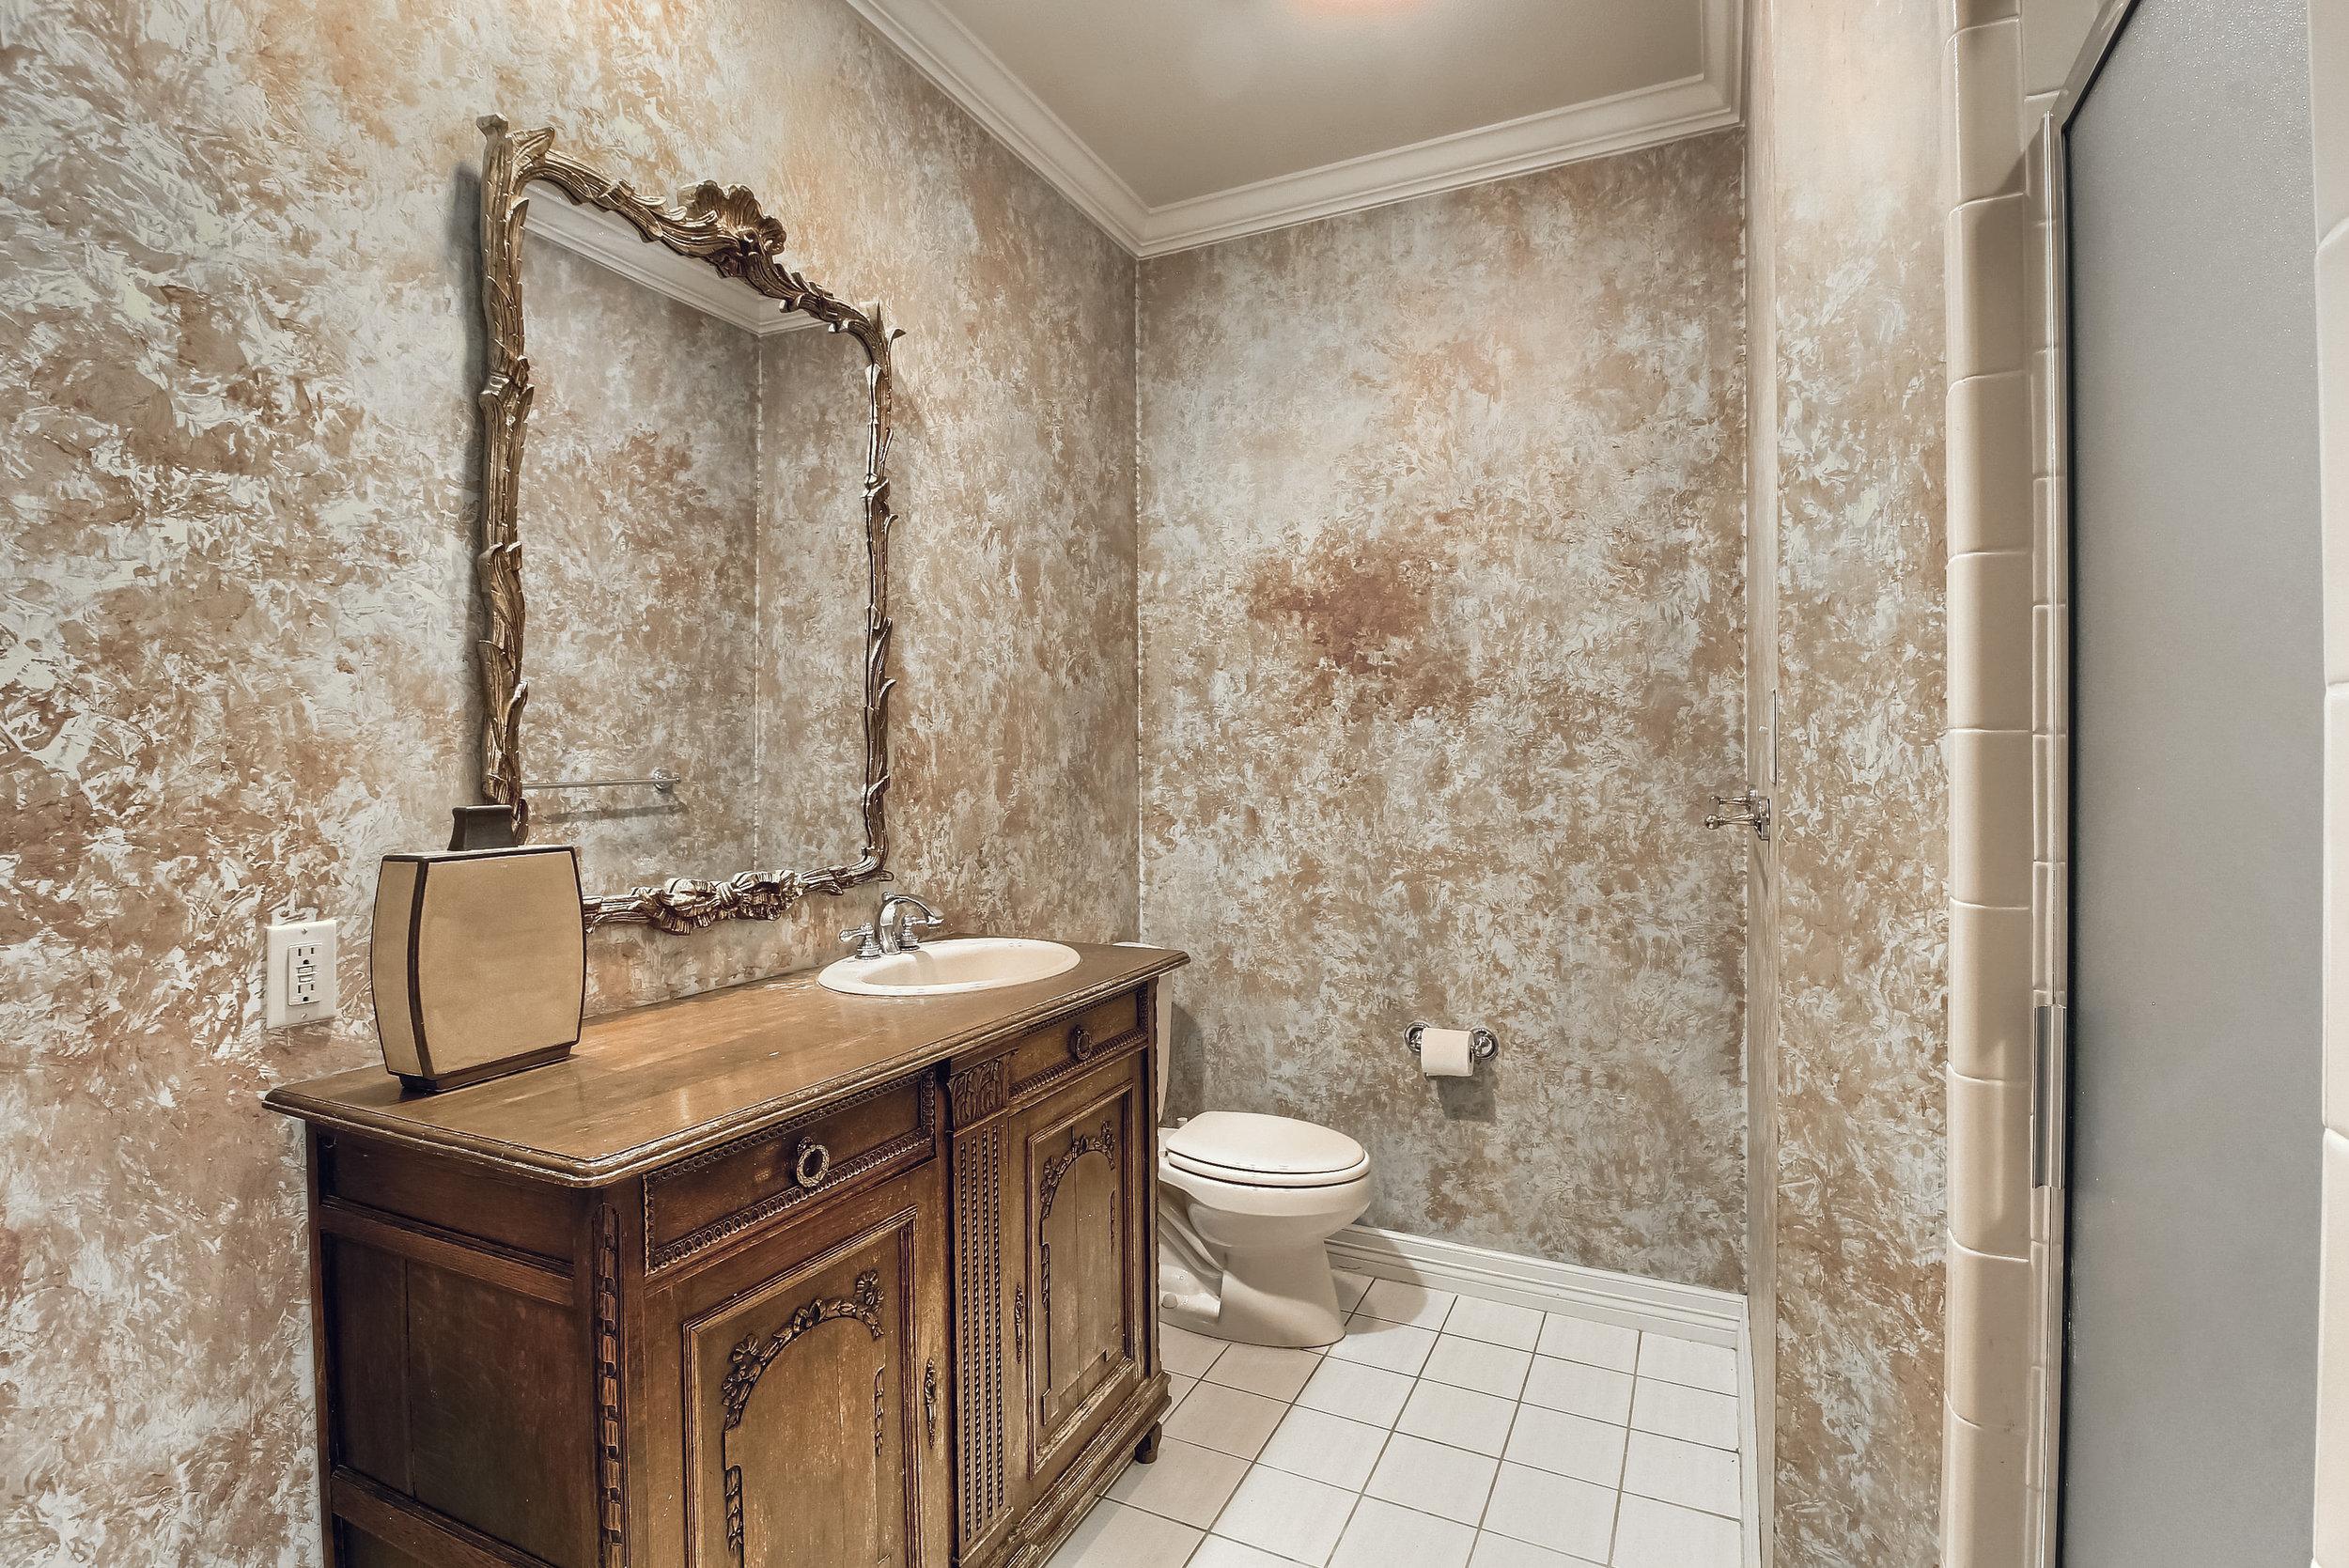 07_Bathroom_IMG_0767.JPG